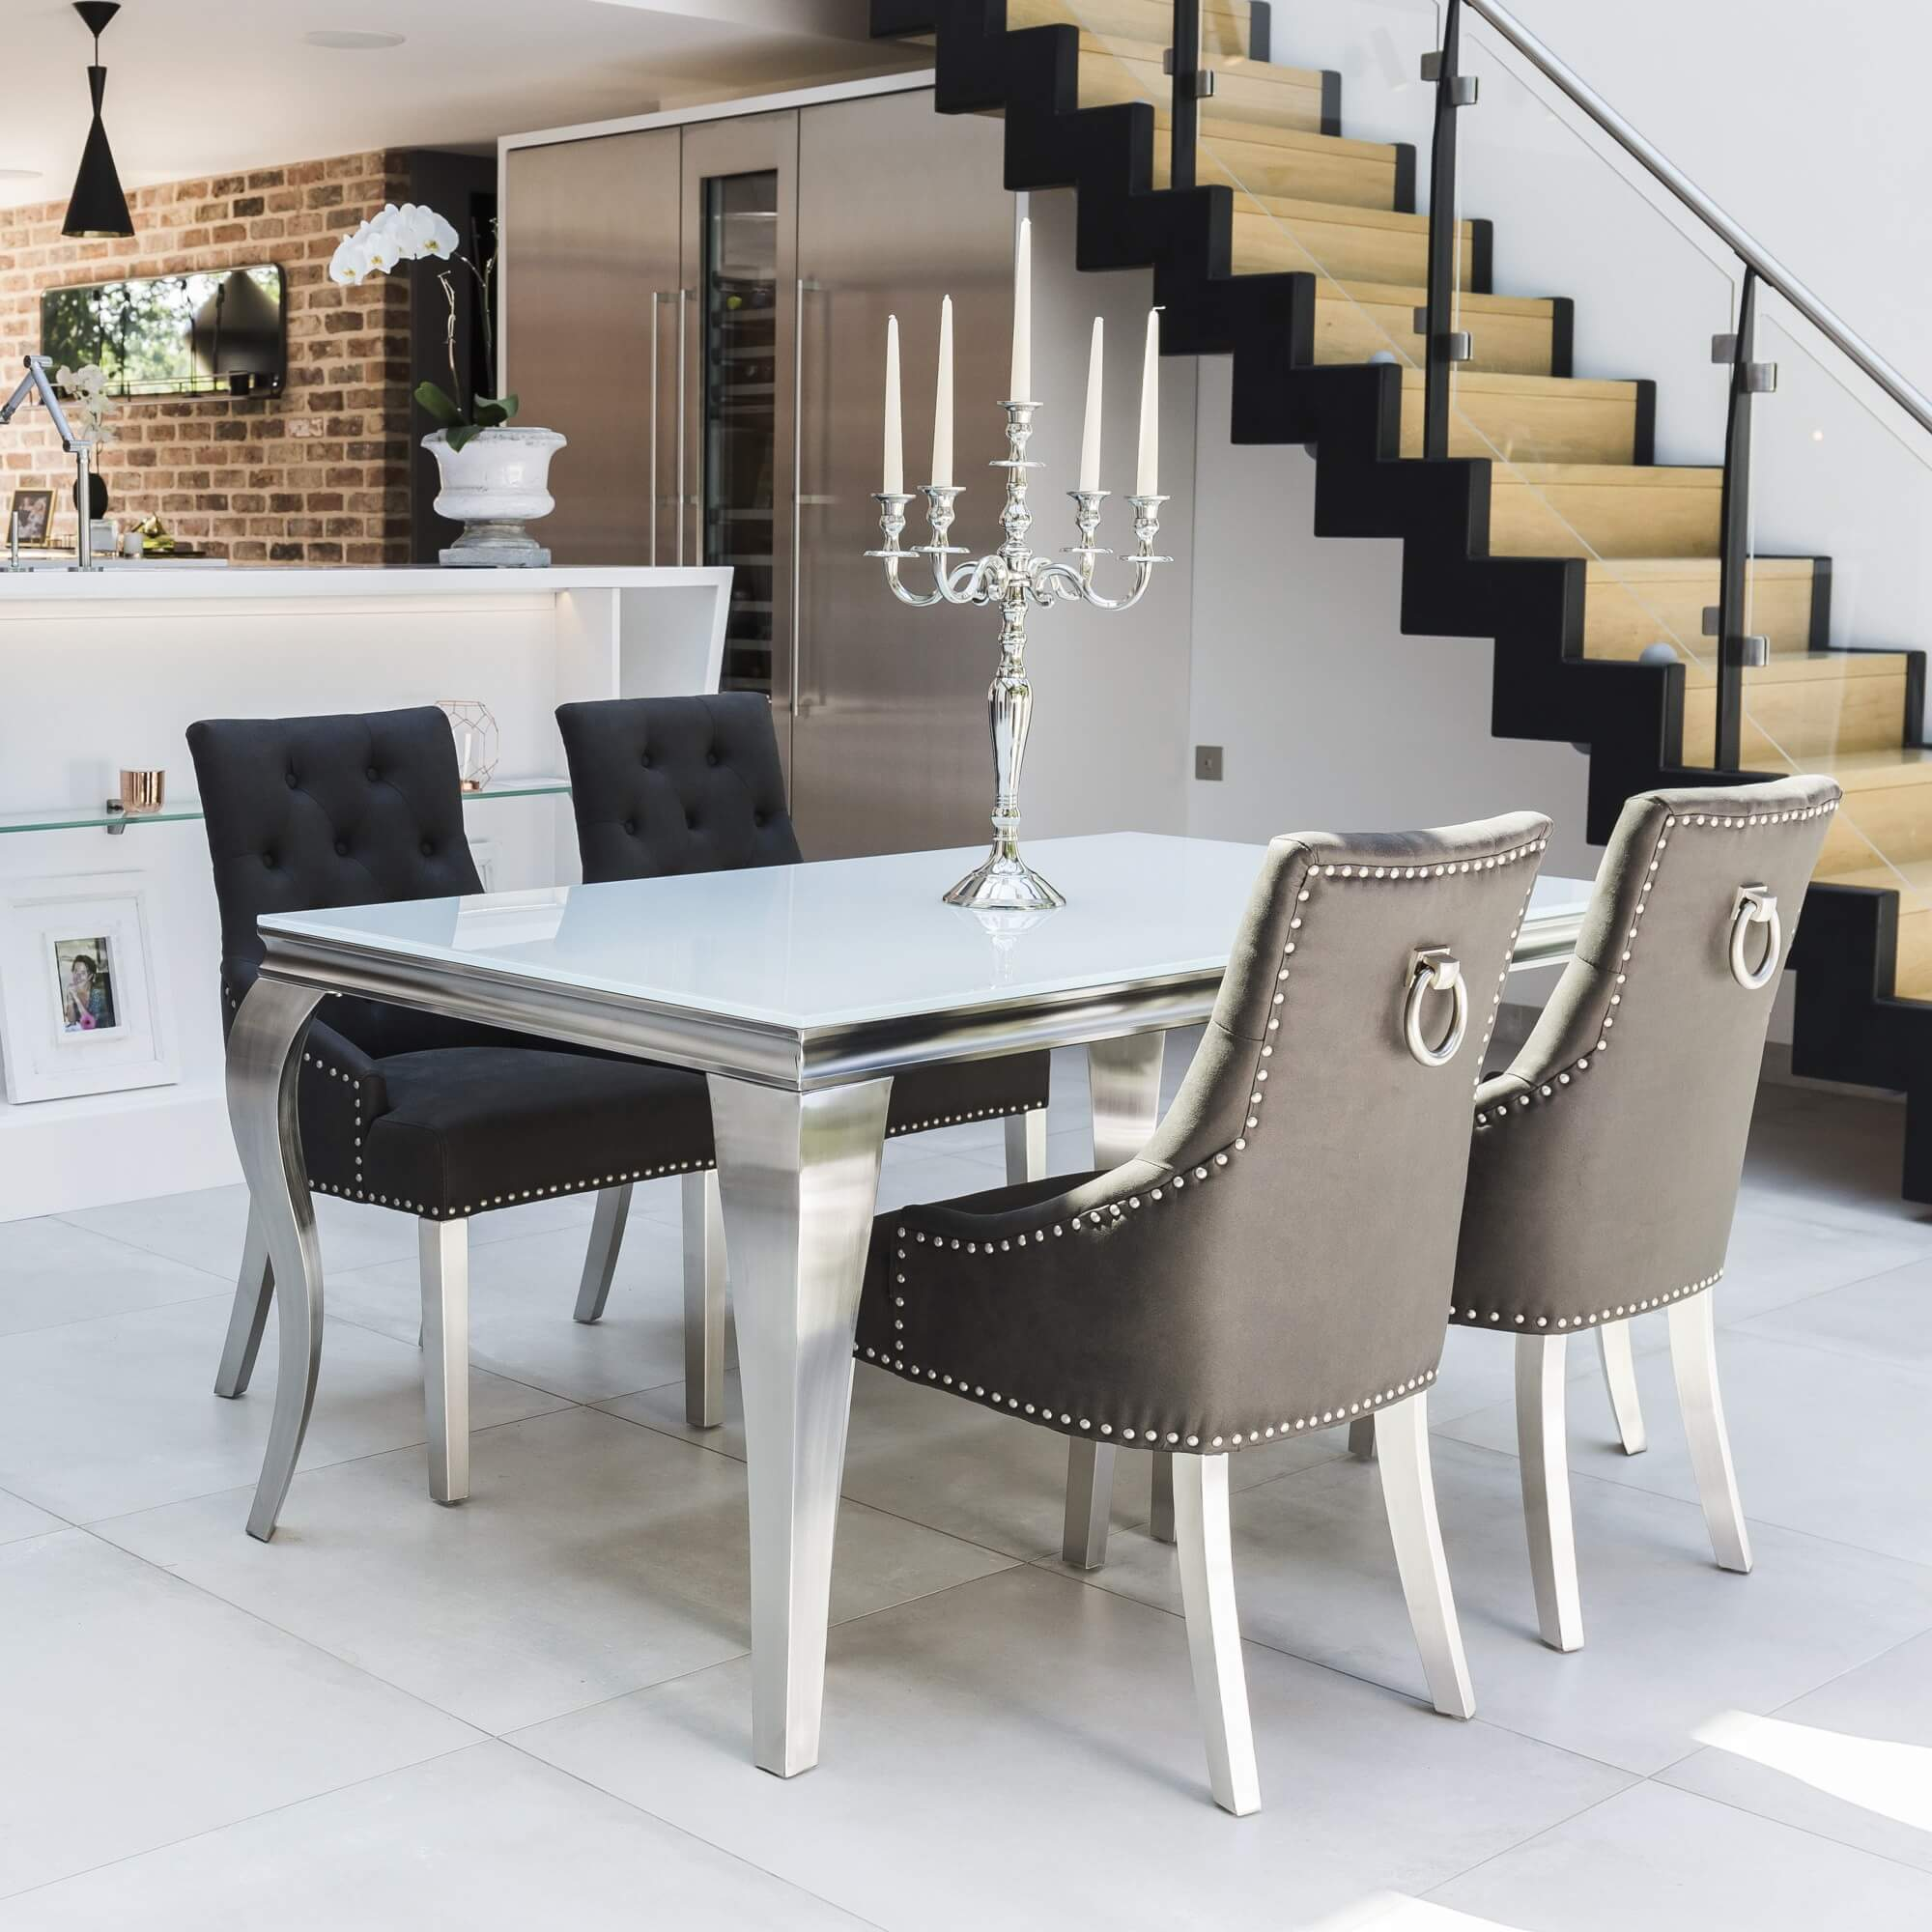 de221a50de Luxury & Affordable Dining Room Furniture   Grosvenor Furniture